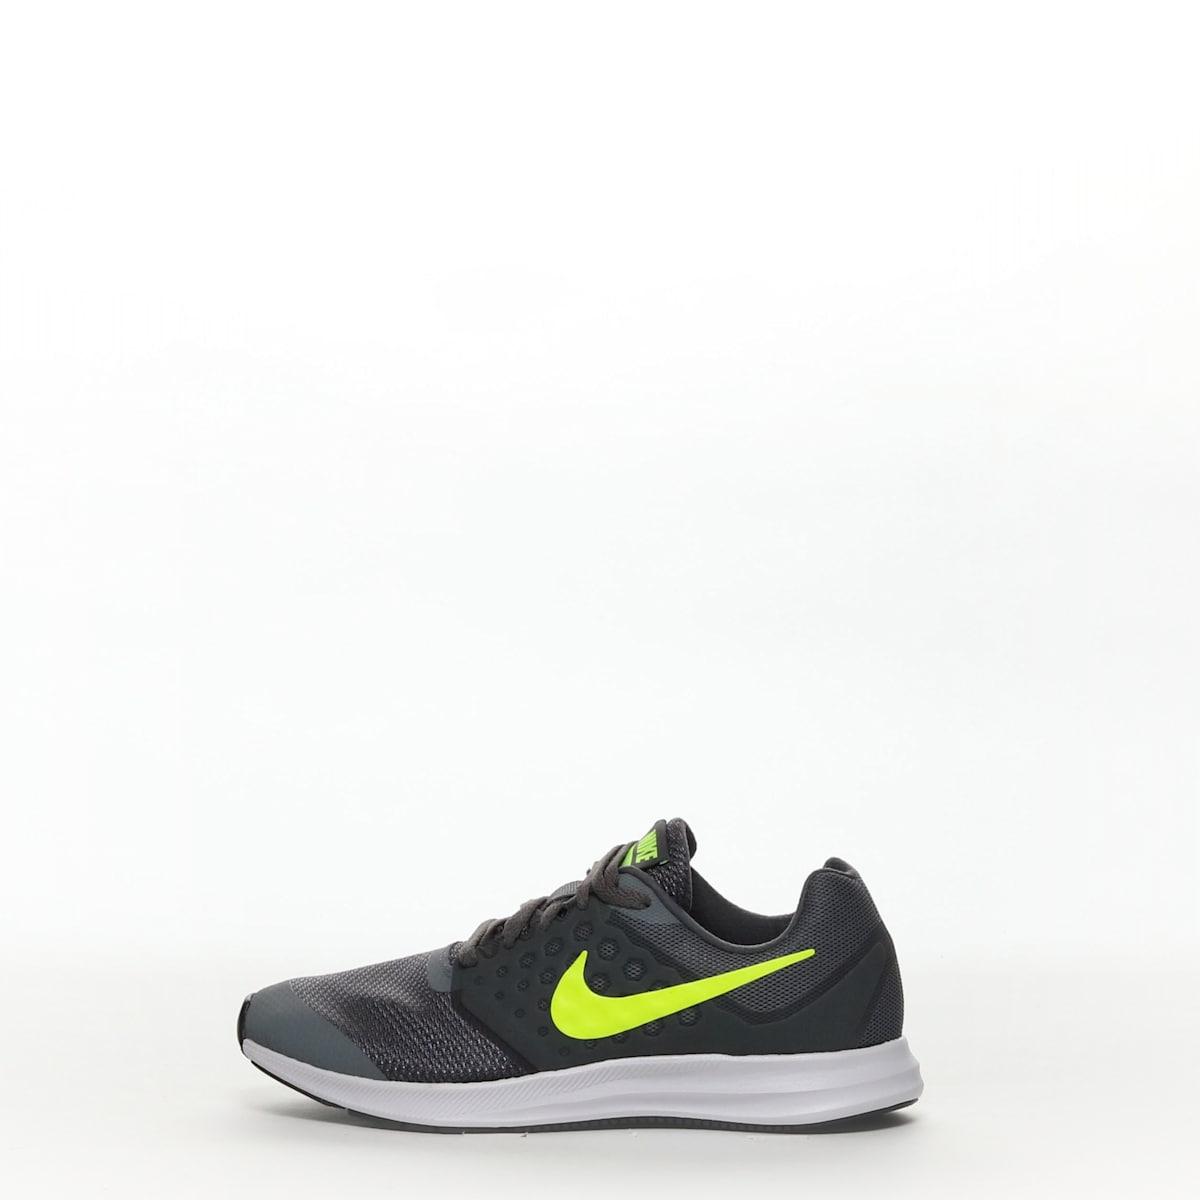 cdd86e6603 Boys' Nike Downshifter 7 Wide (GS) Running Shoe - COL GY/VOLT – Resku